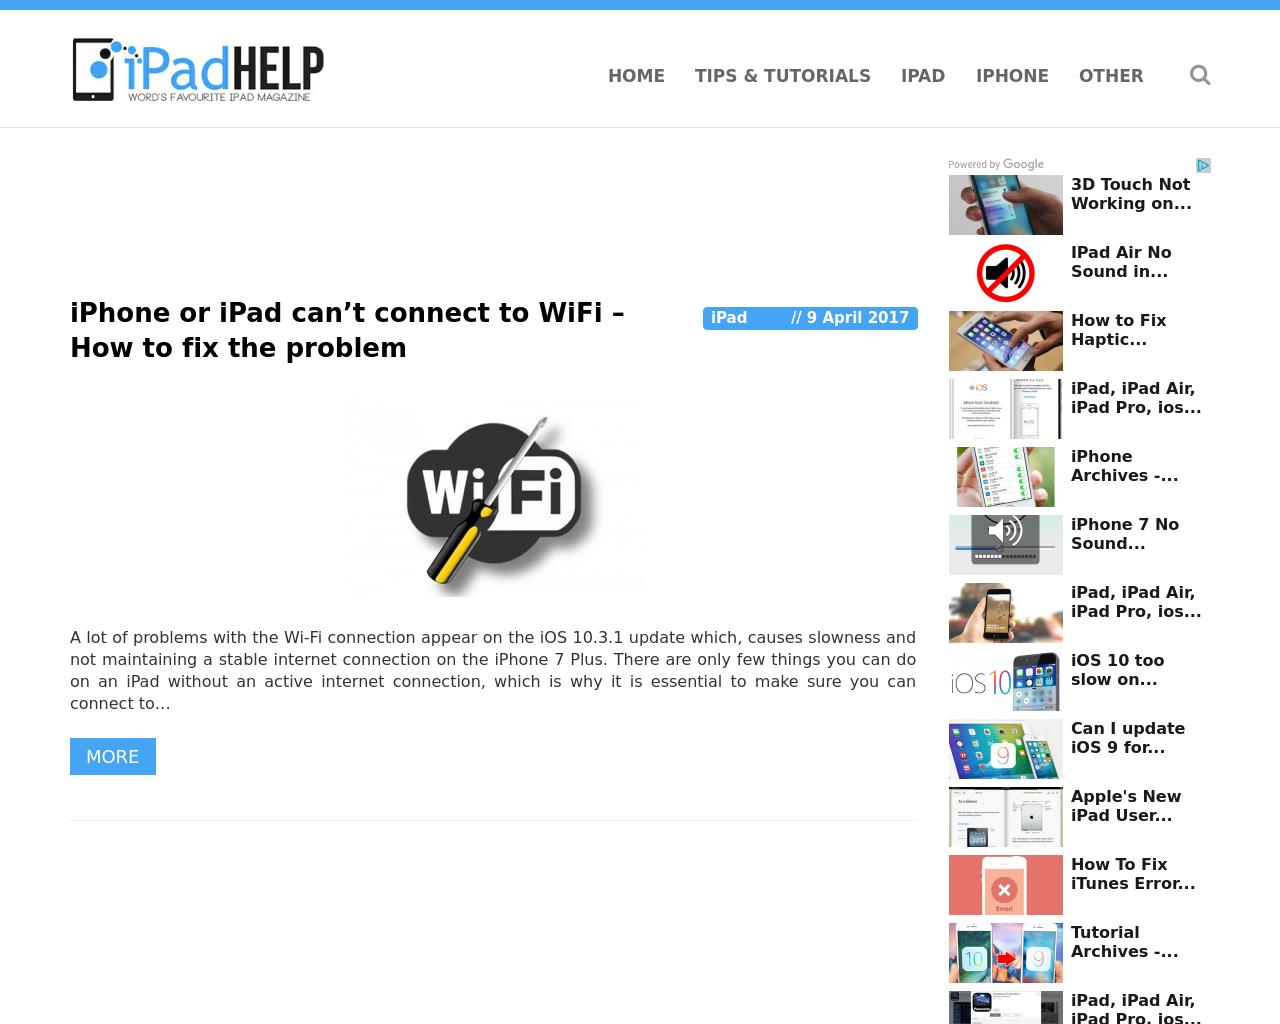 iPad-Help-Advertising-Reviews-Pricing